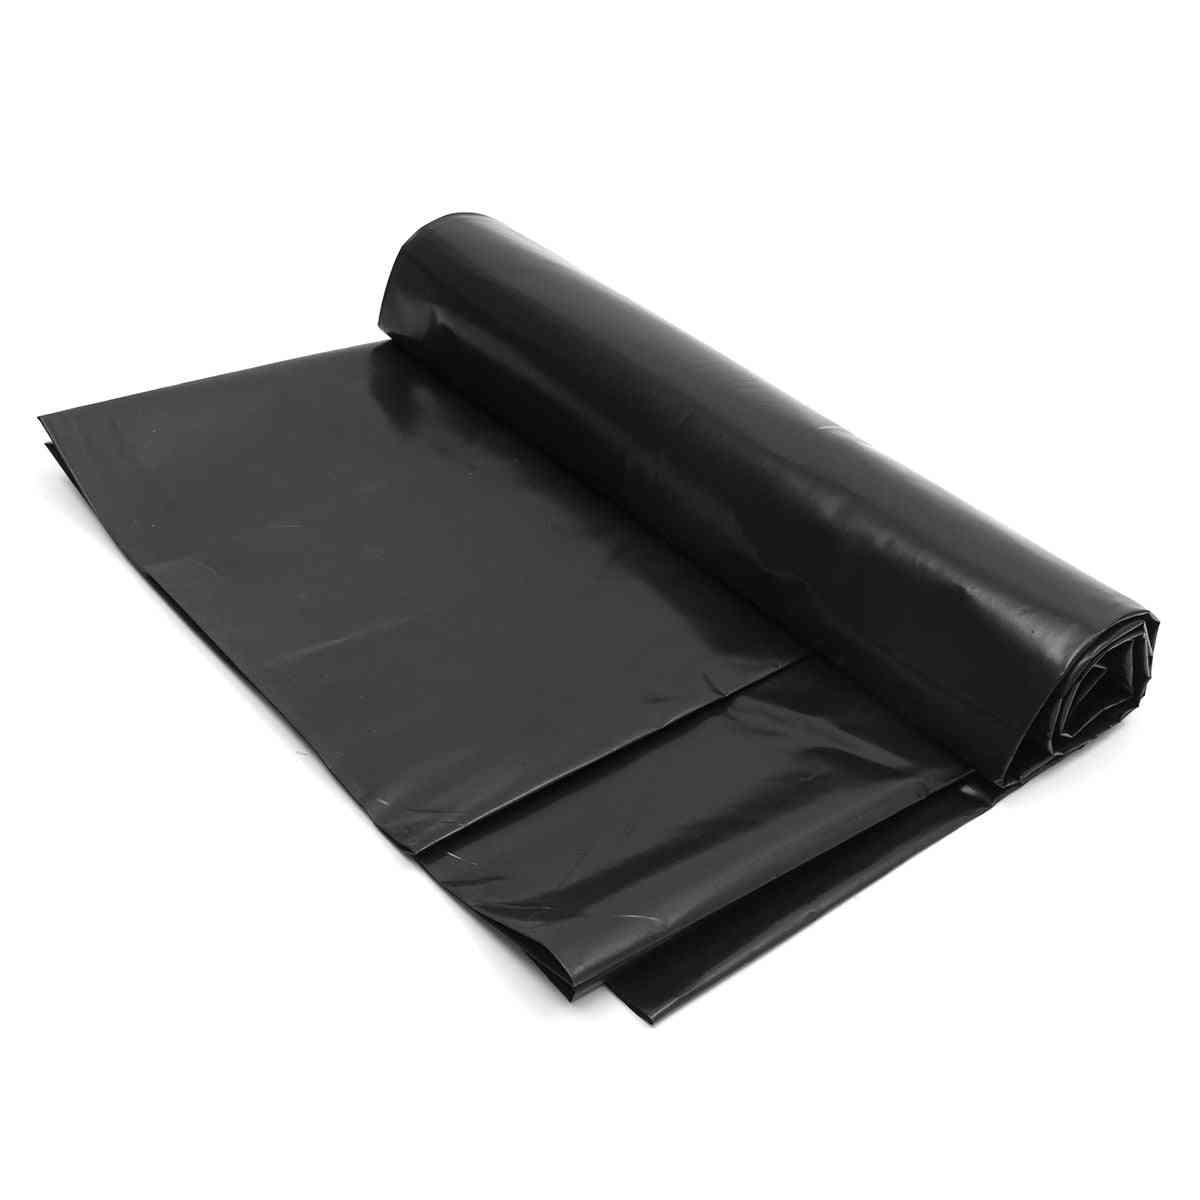 Fish Pond Liner, Garden Landscaping Pool Reinforced, Waterproof Membrane Cloth